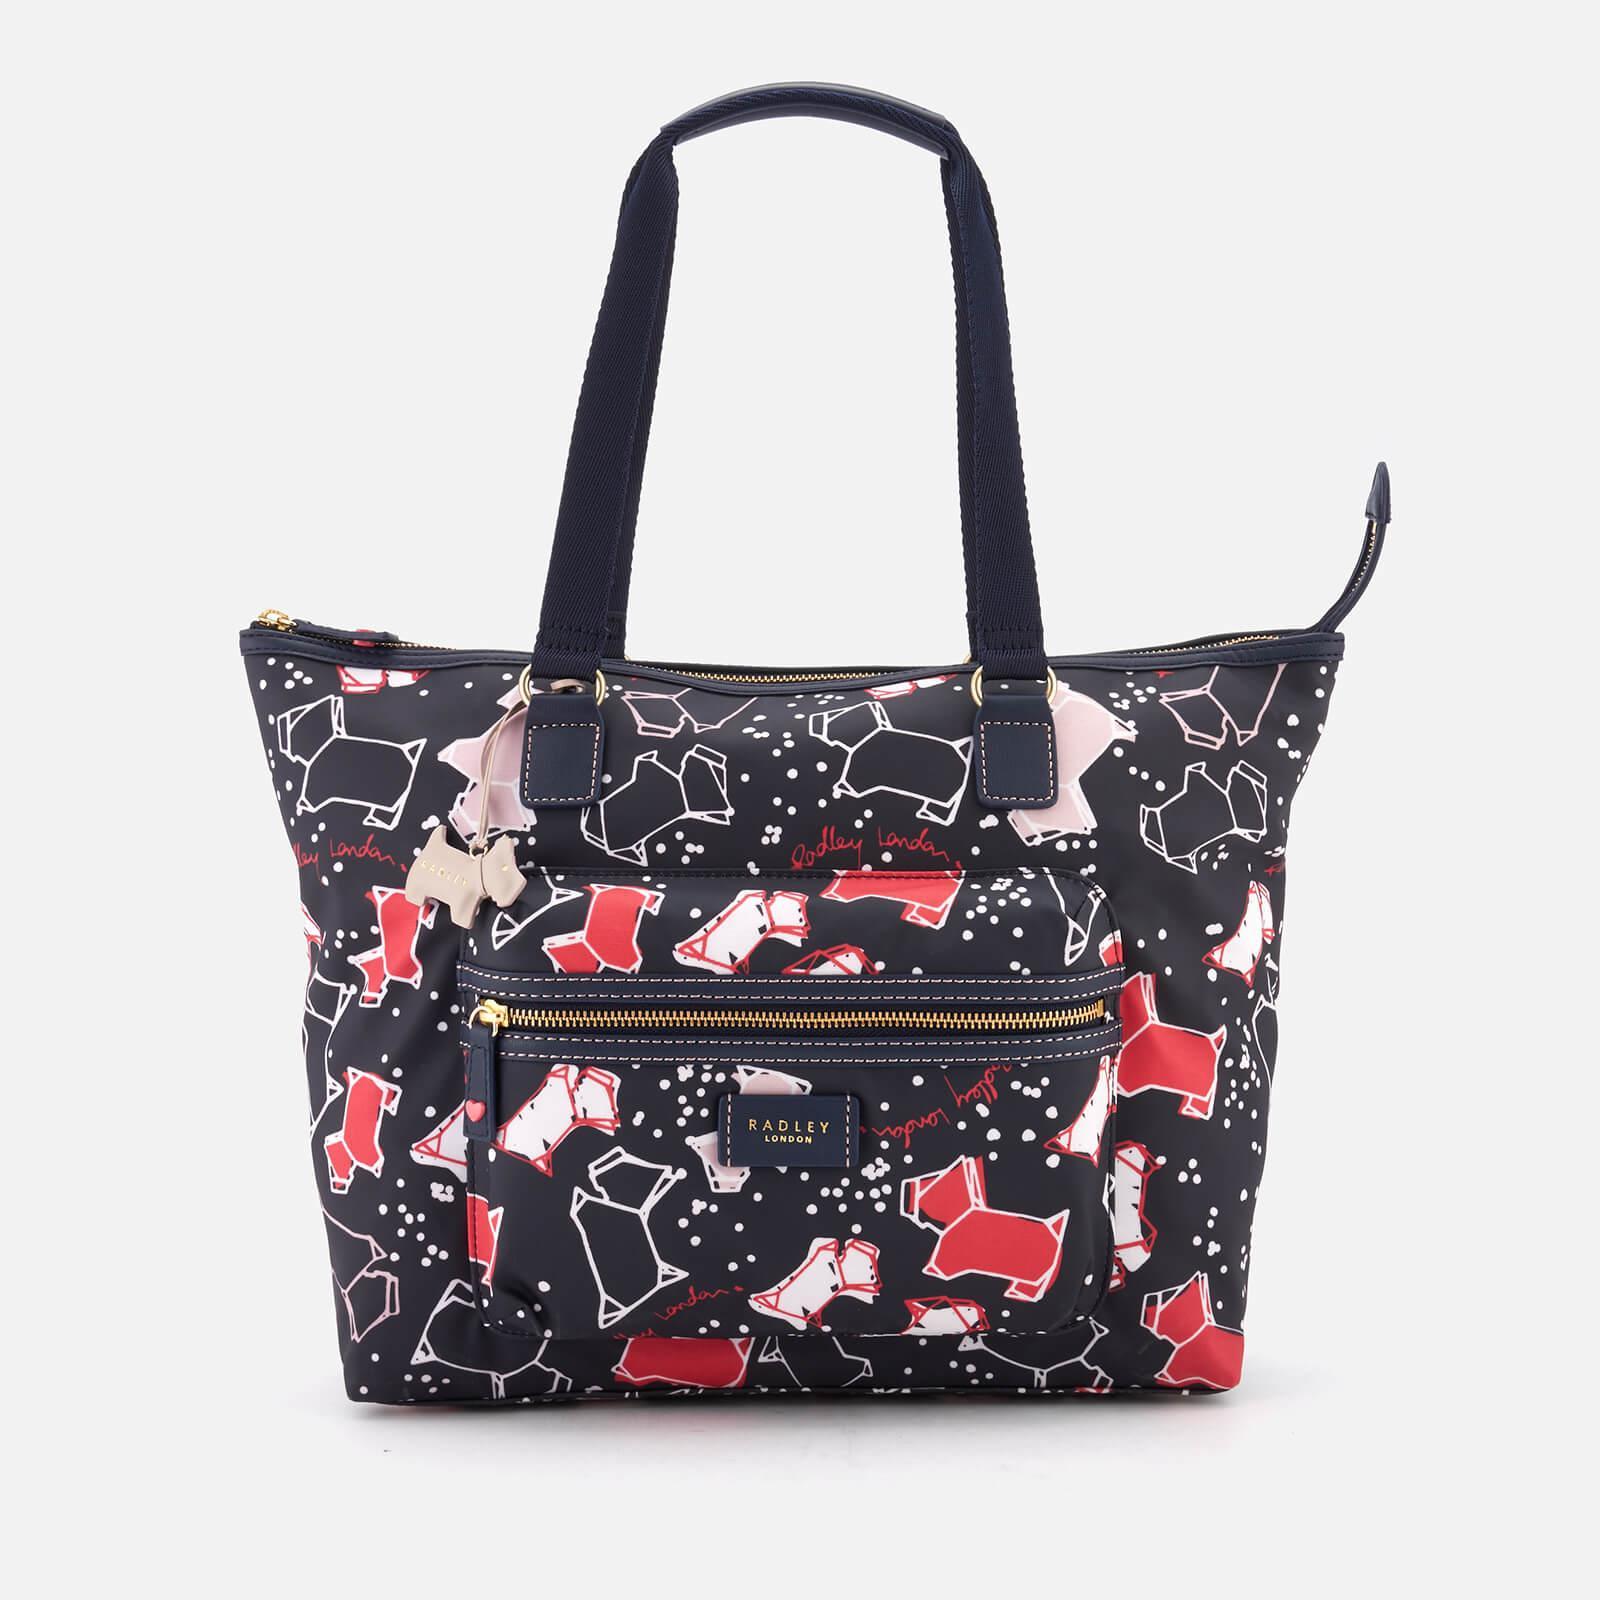 Burberry Dog Carry Bag Uk